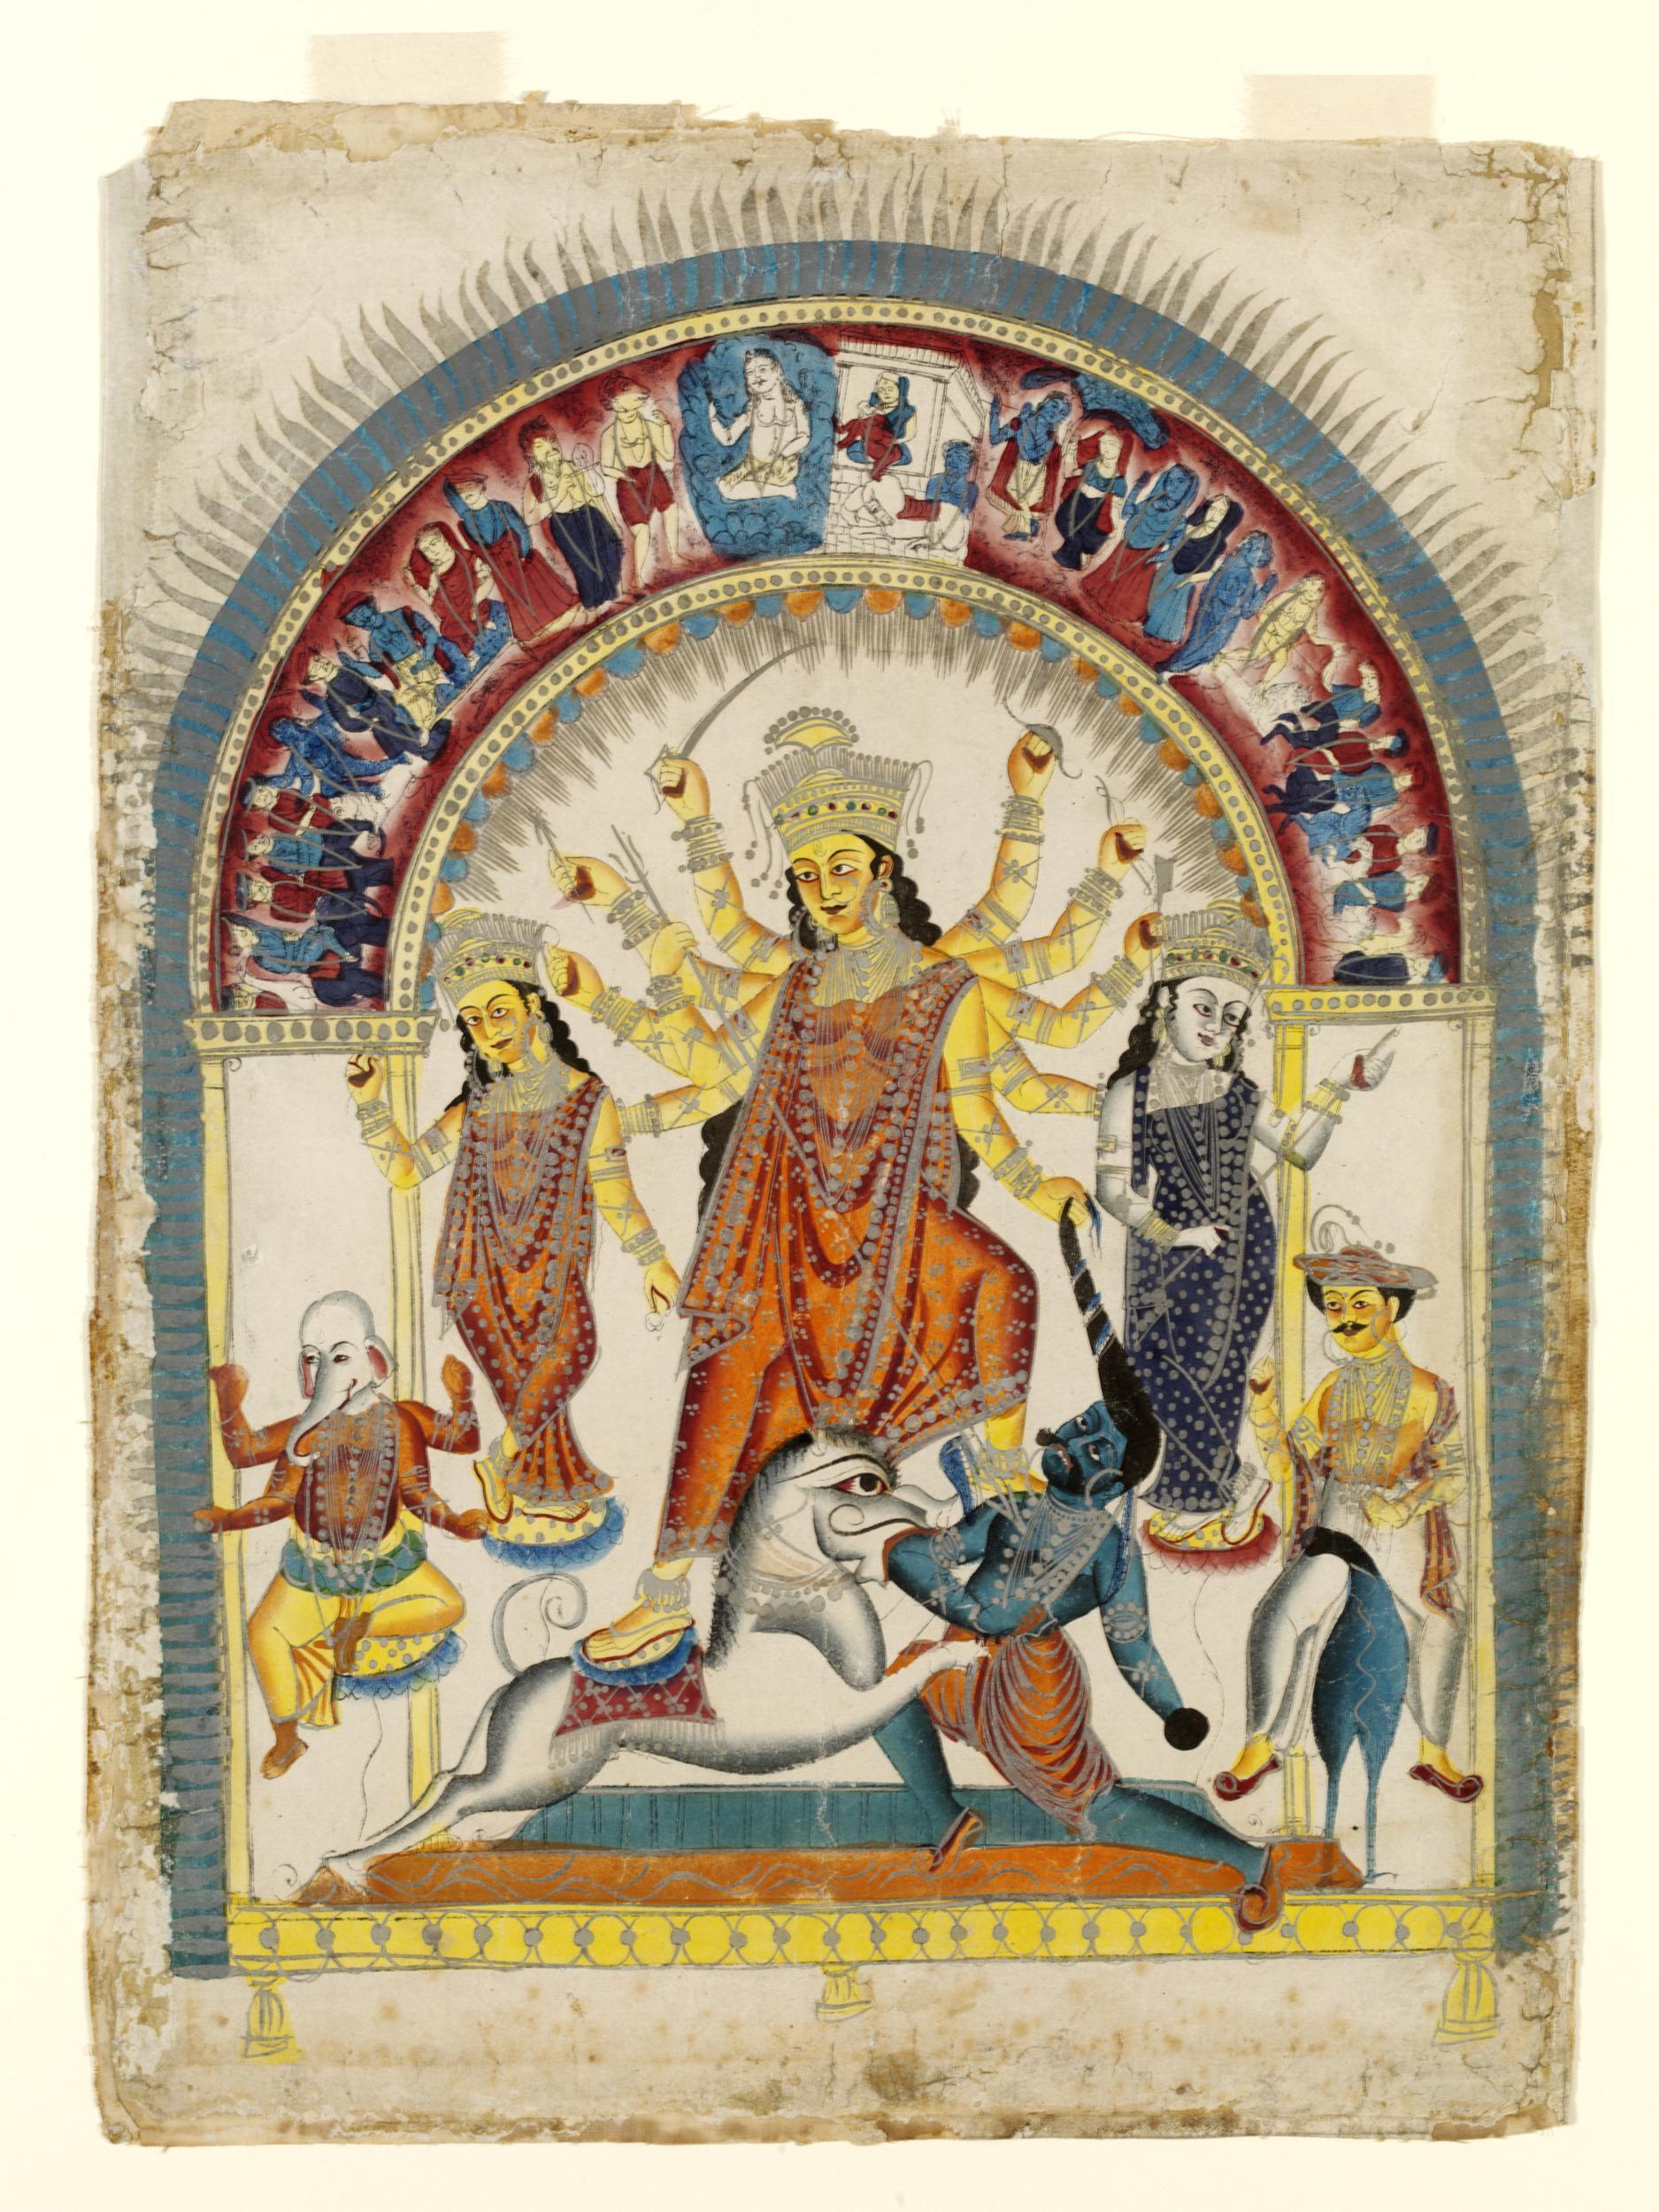 Durga and Mahishasura - Kalighat Pata, Calcutta (Kolkata) c1860